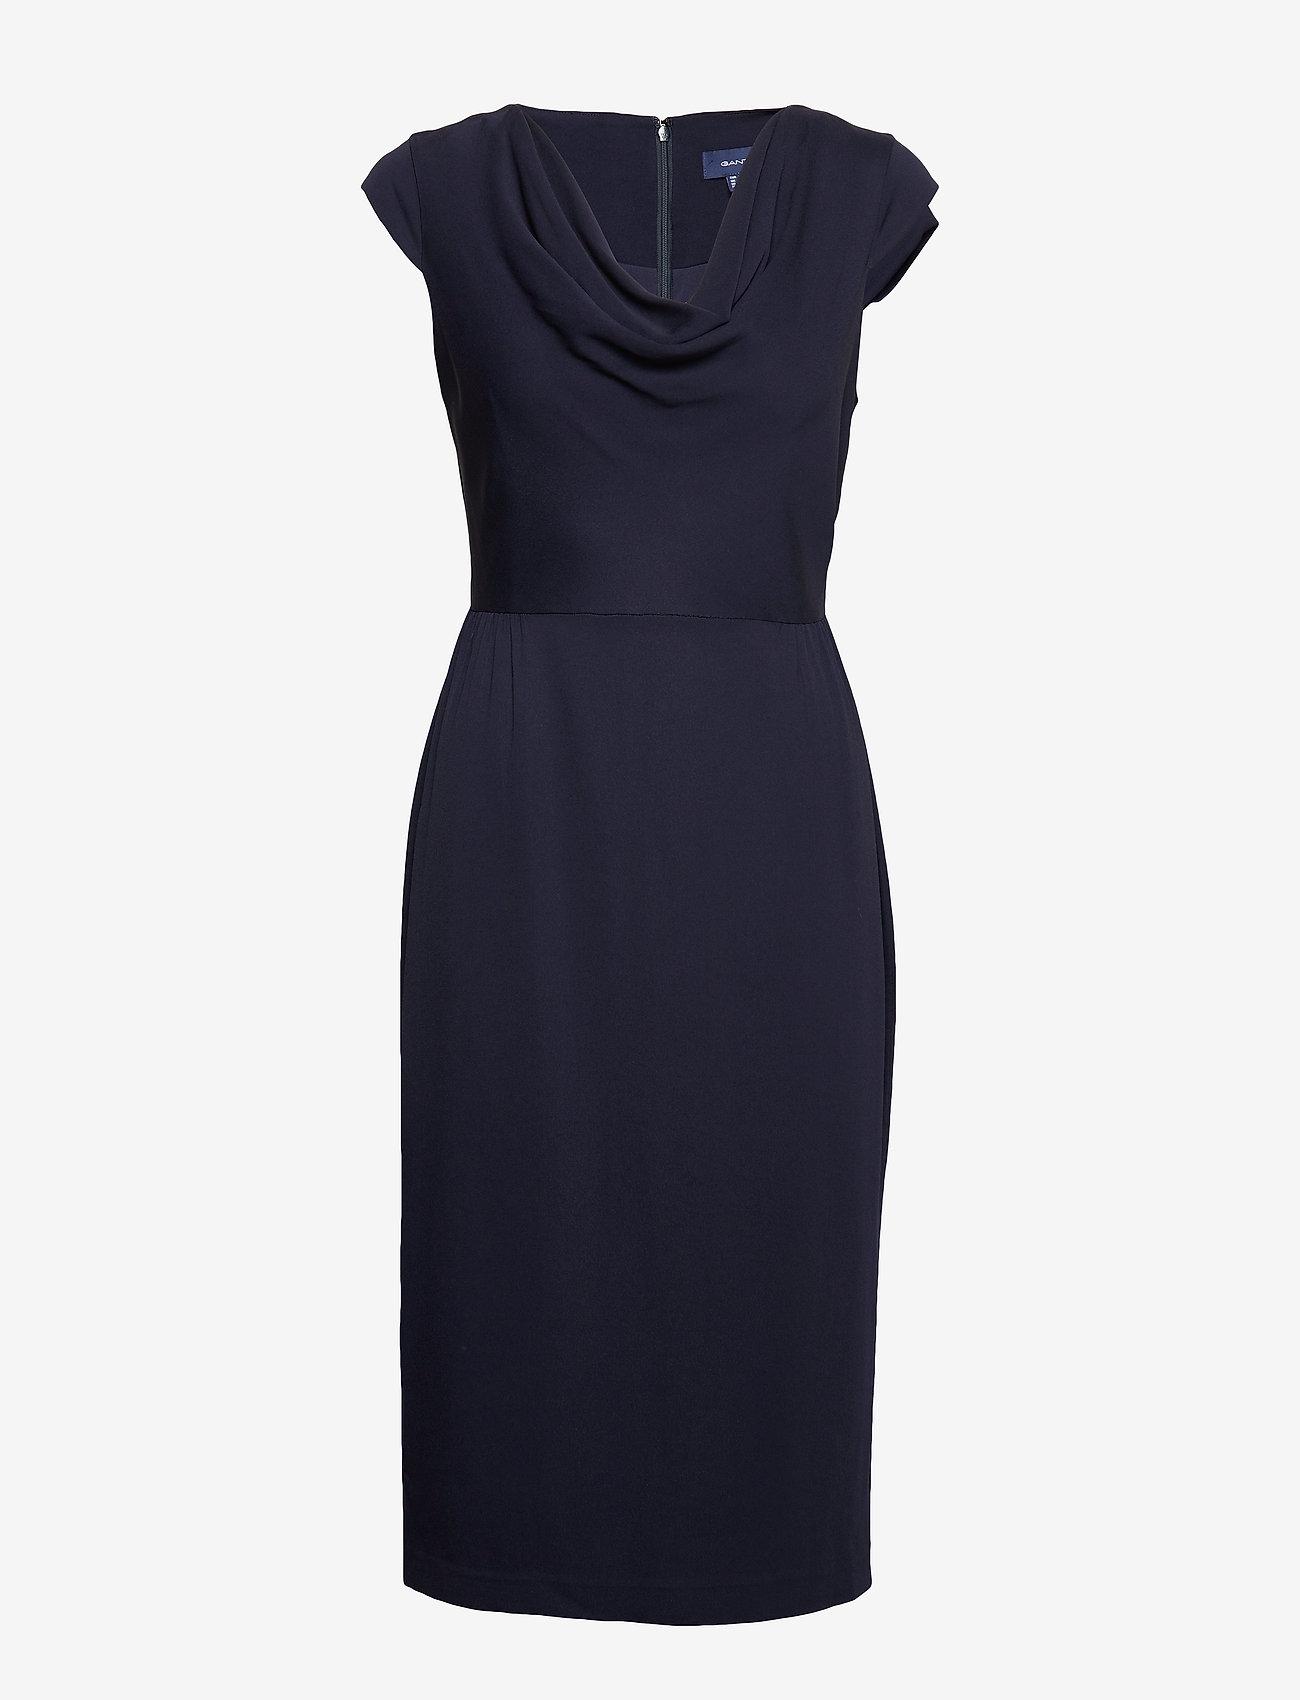 Gant - D2. HOLIDAY DRESS - midimekot - evening blue